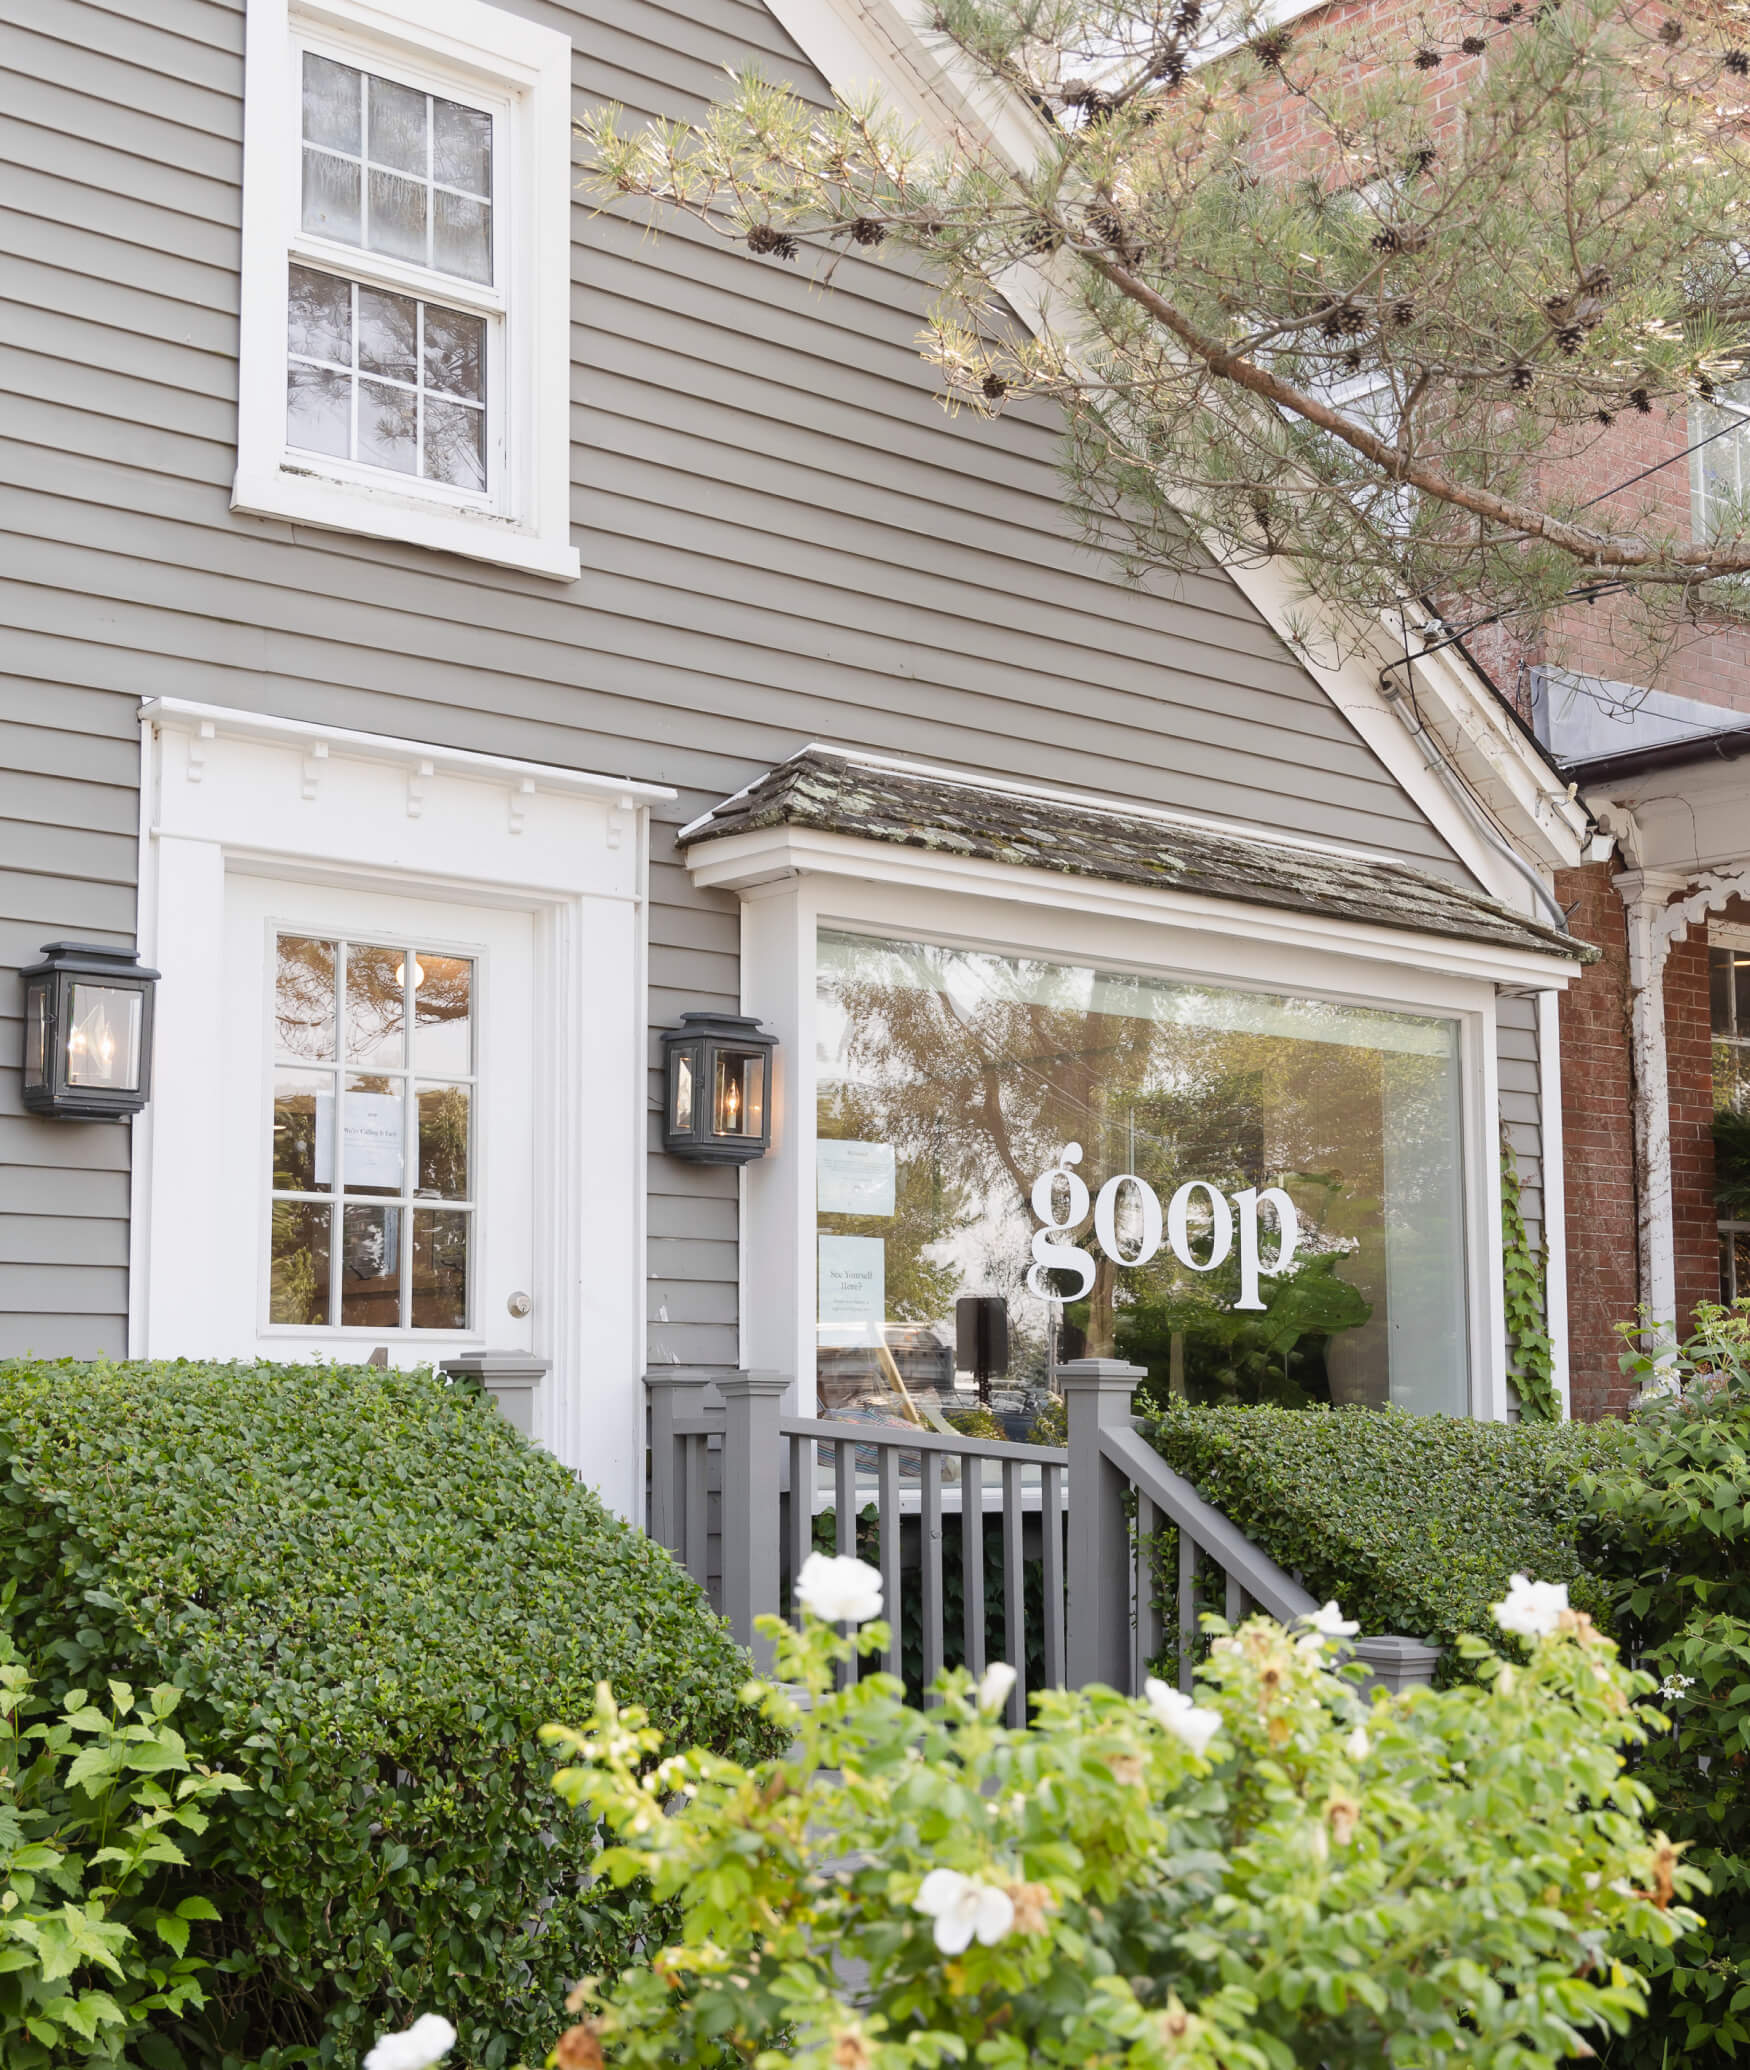 goop house